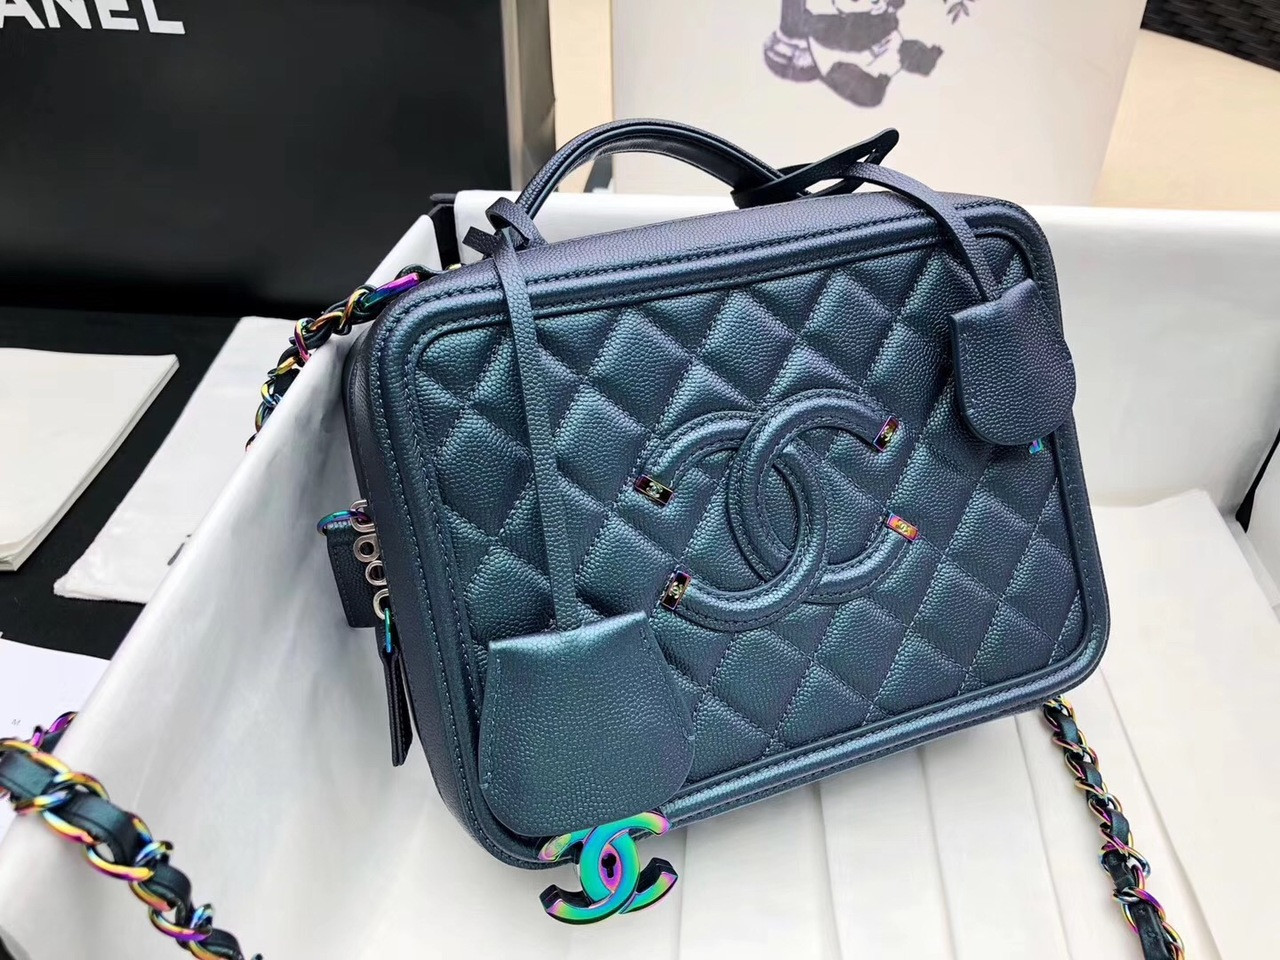 c2bfcd0822c3 CHANEL Large Vanity Case Iridescent Metal 2018 - Bella Vita Moda